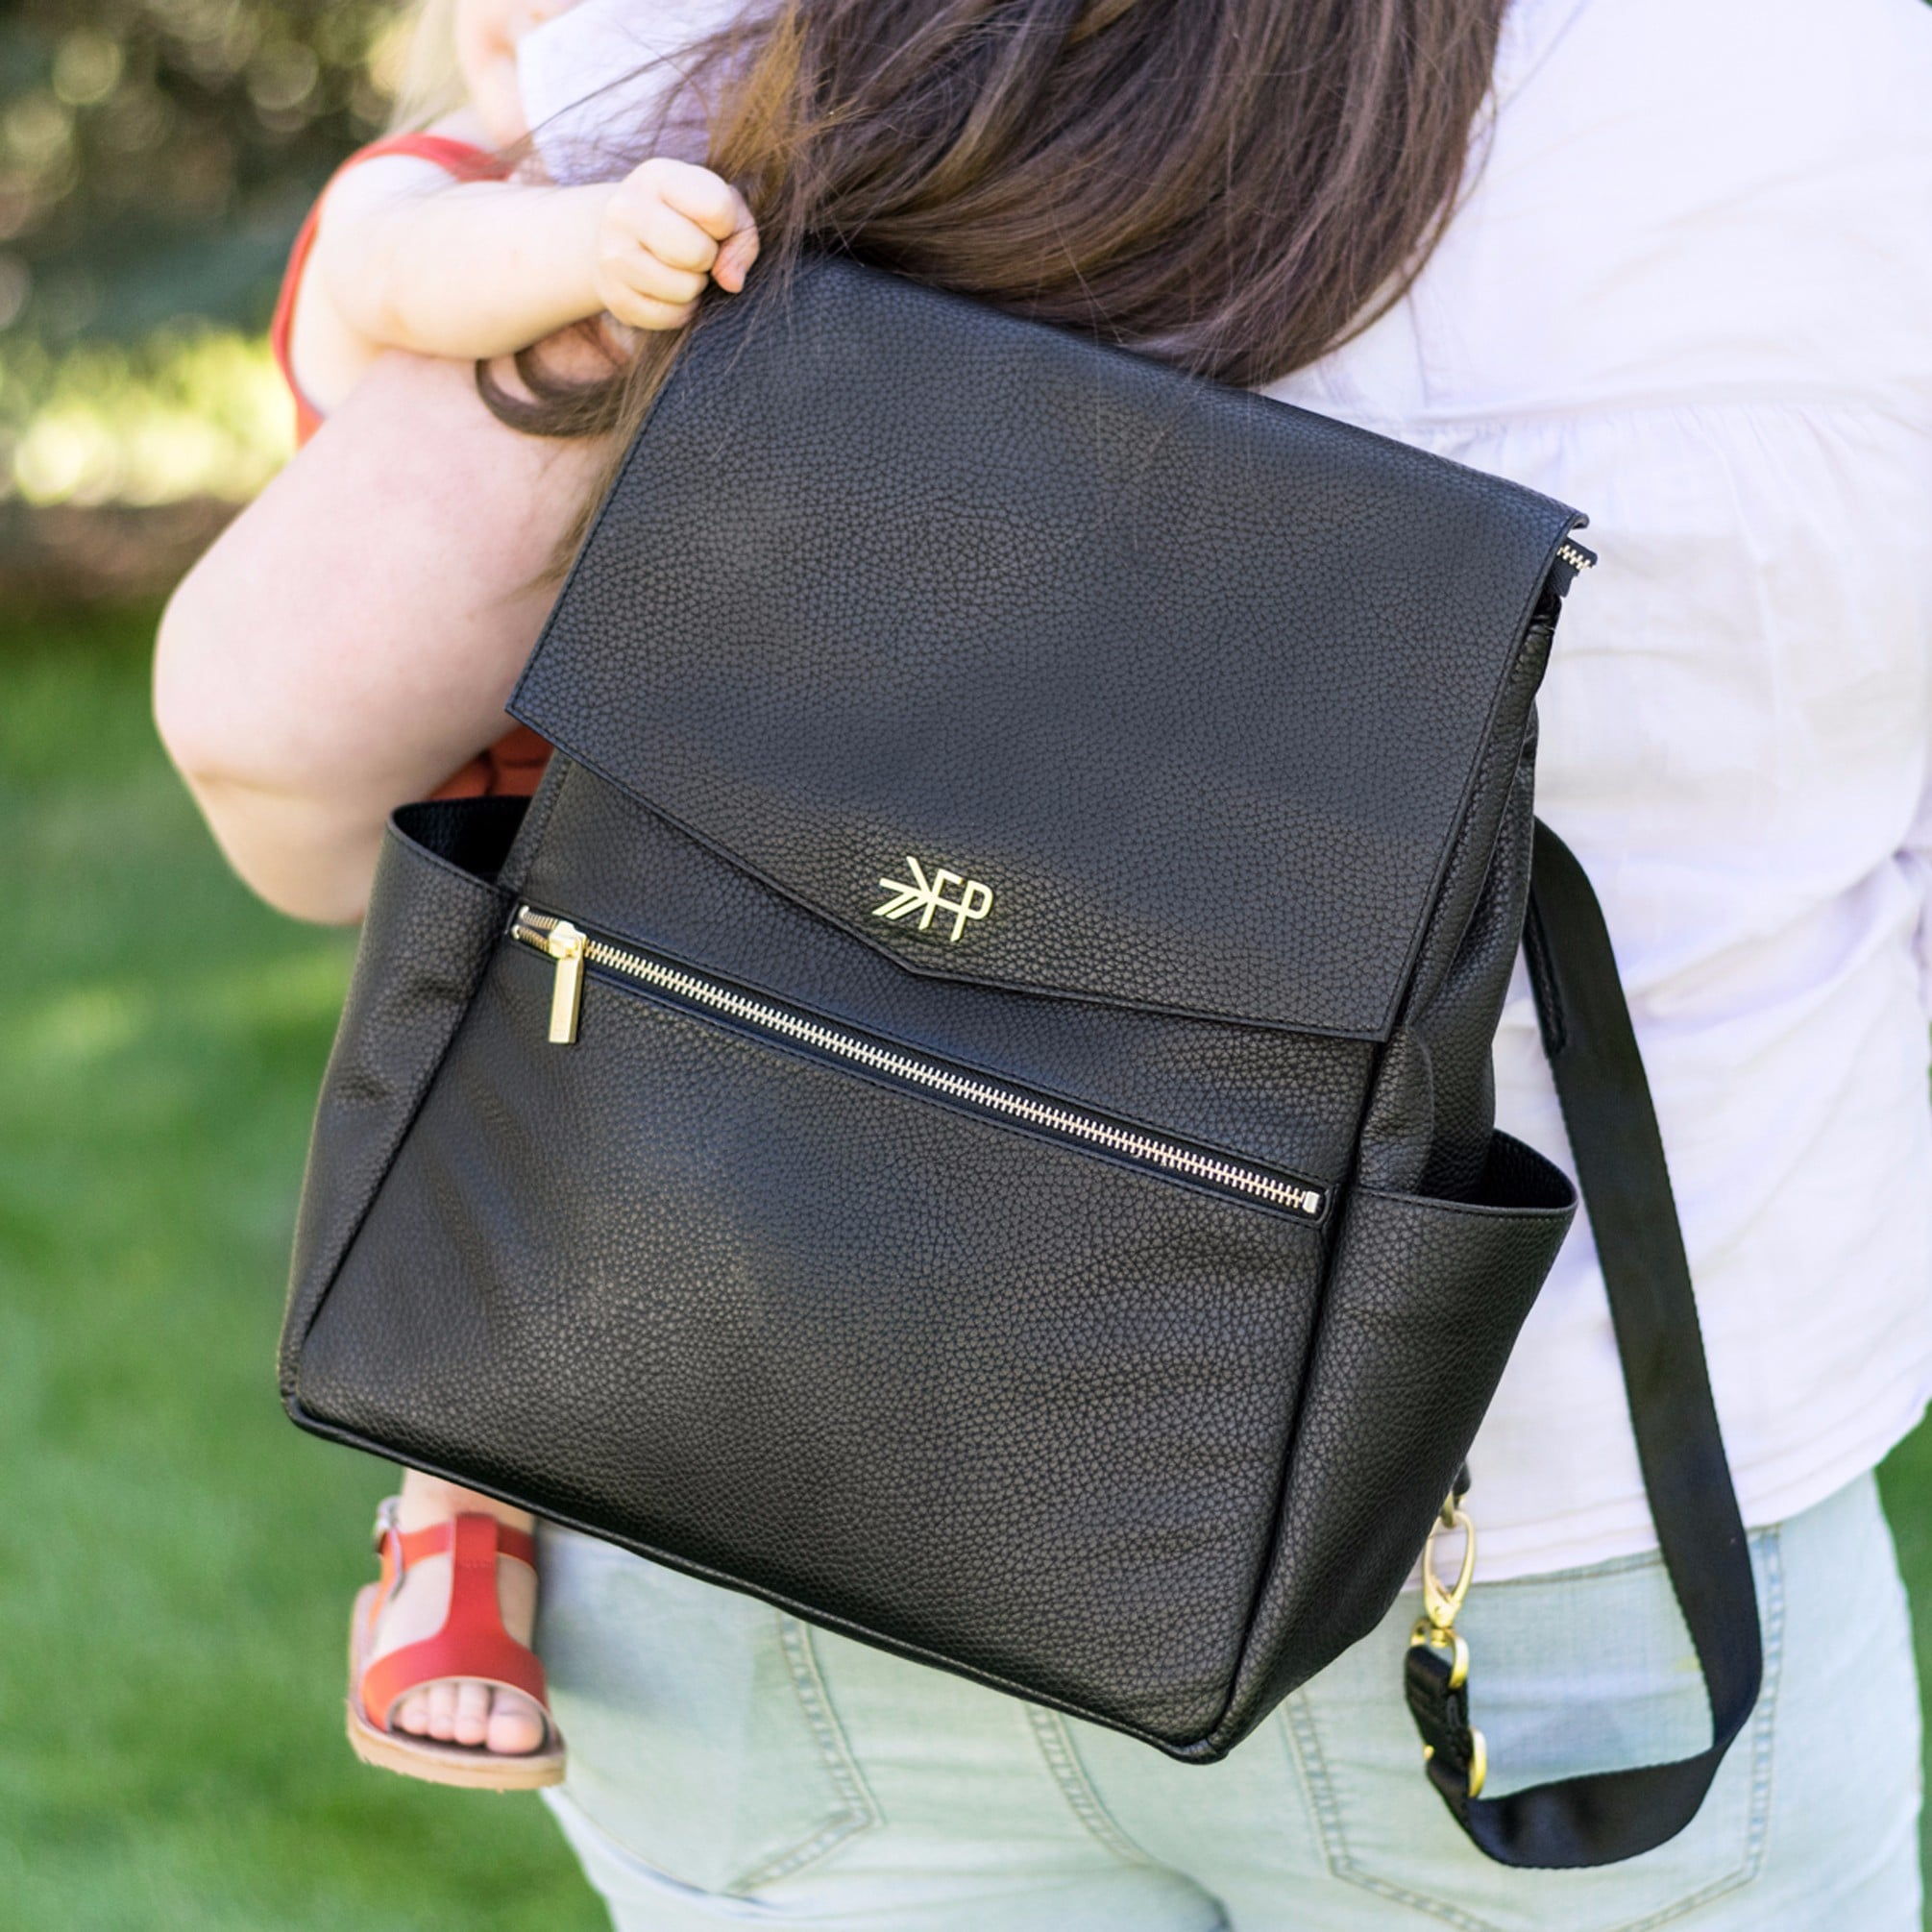 9432edad7df8 Kate Spade Watson Lane Bethany Baby Bag Handbags